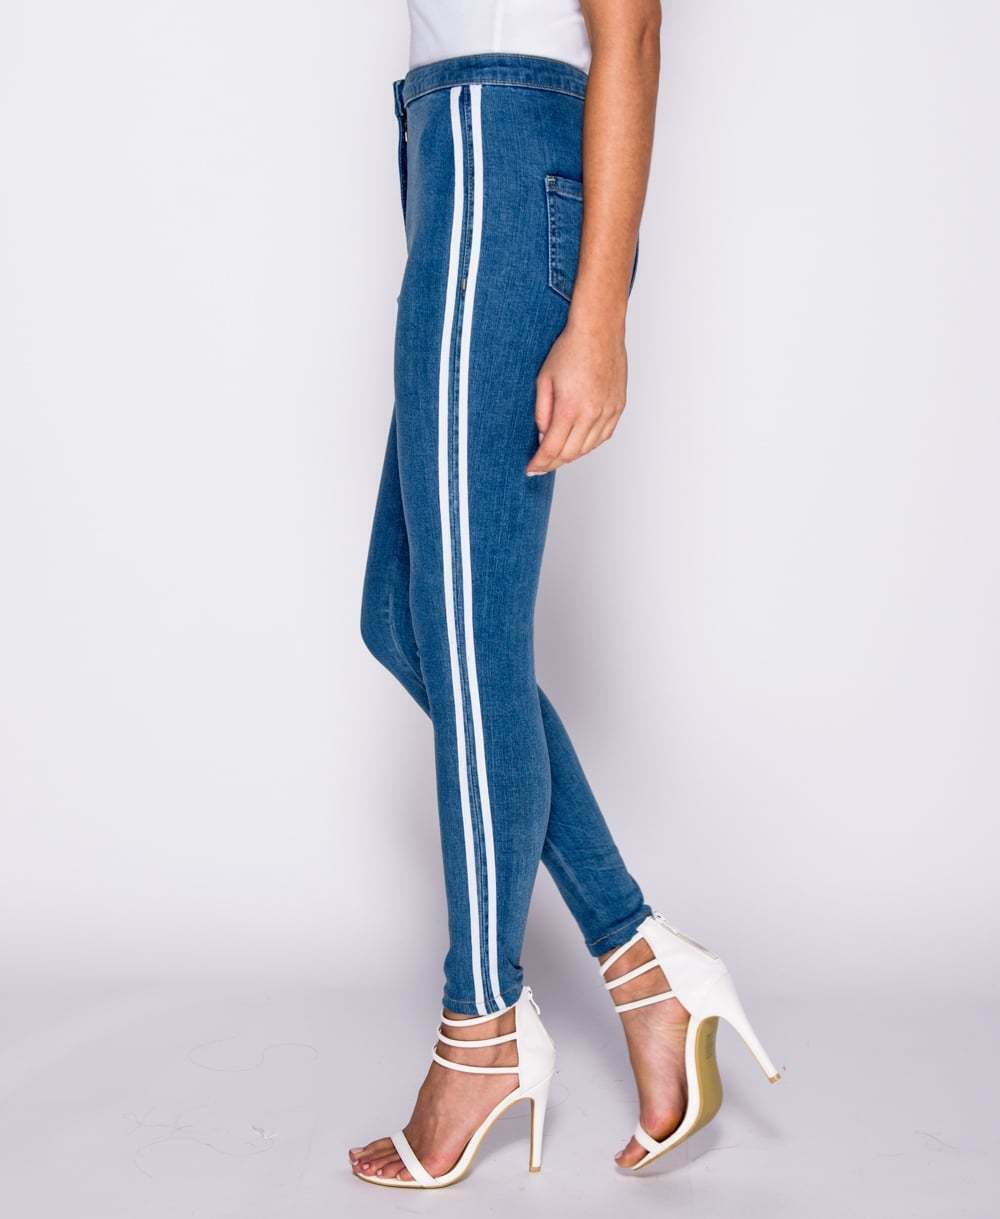 womens stretch skinny denim jeans slim jeggings